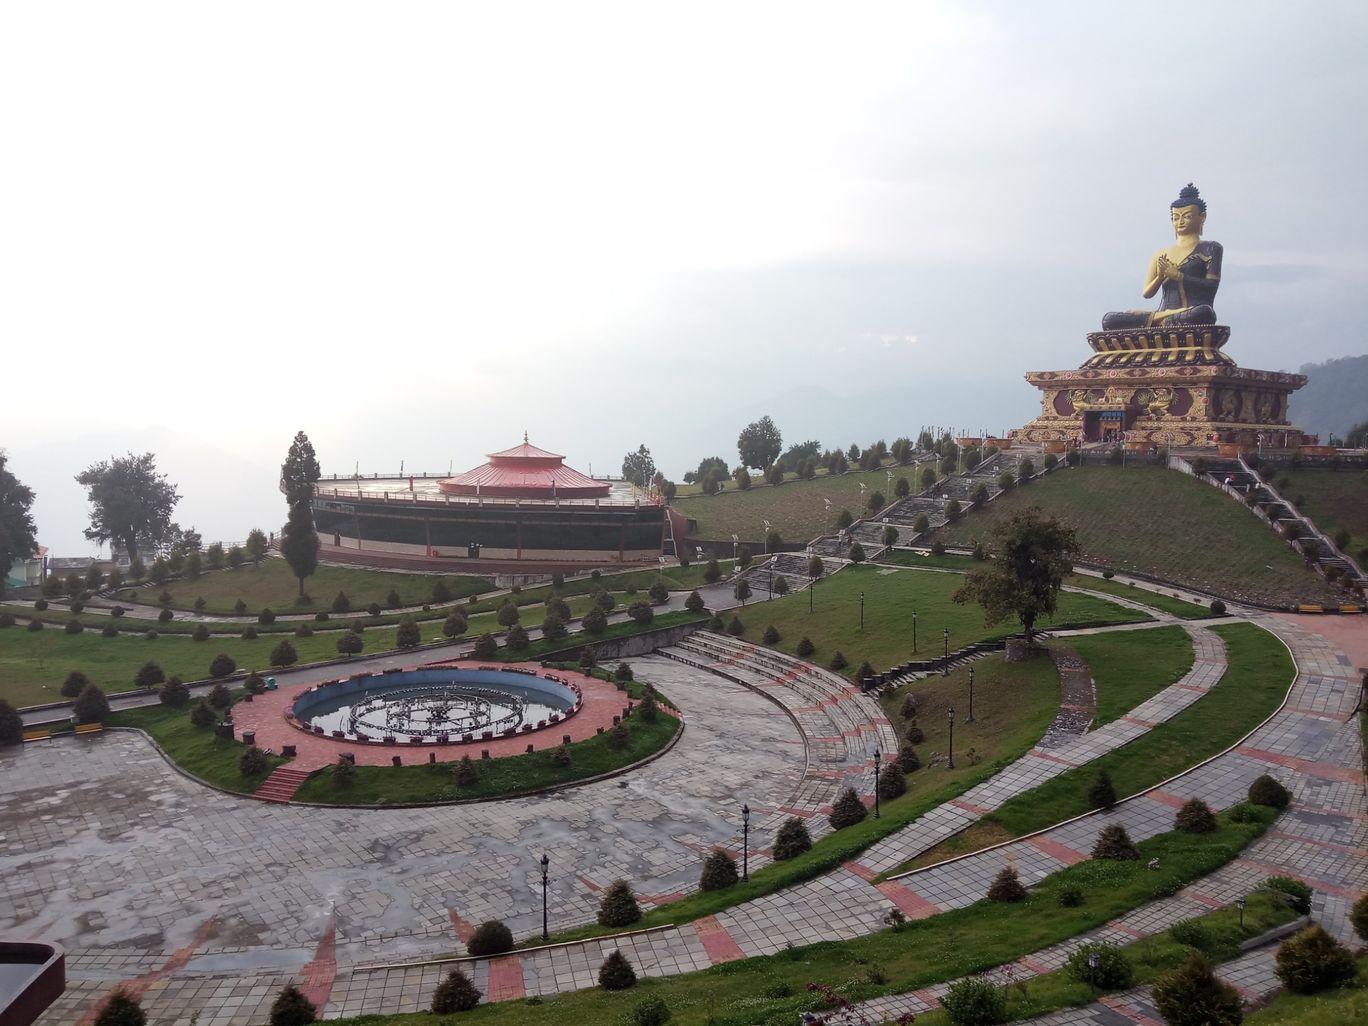 Photo of Tathagata Tsal (Buddha Park) By Hari Chandu Vakacharla